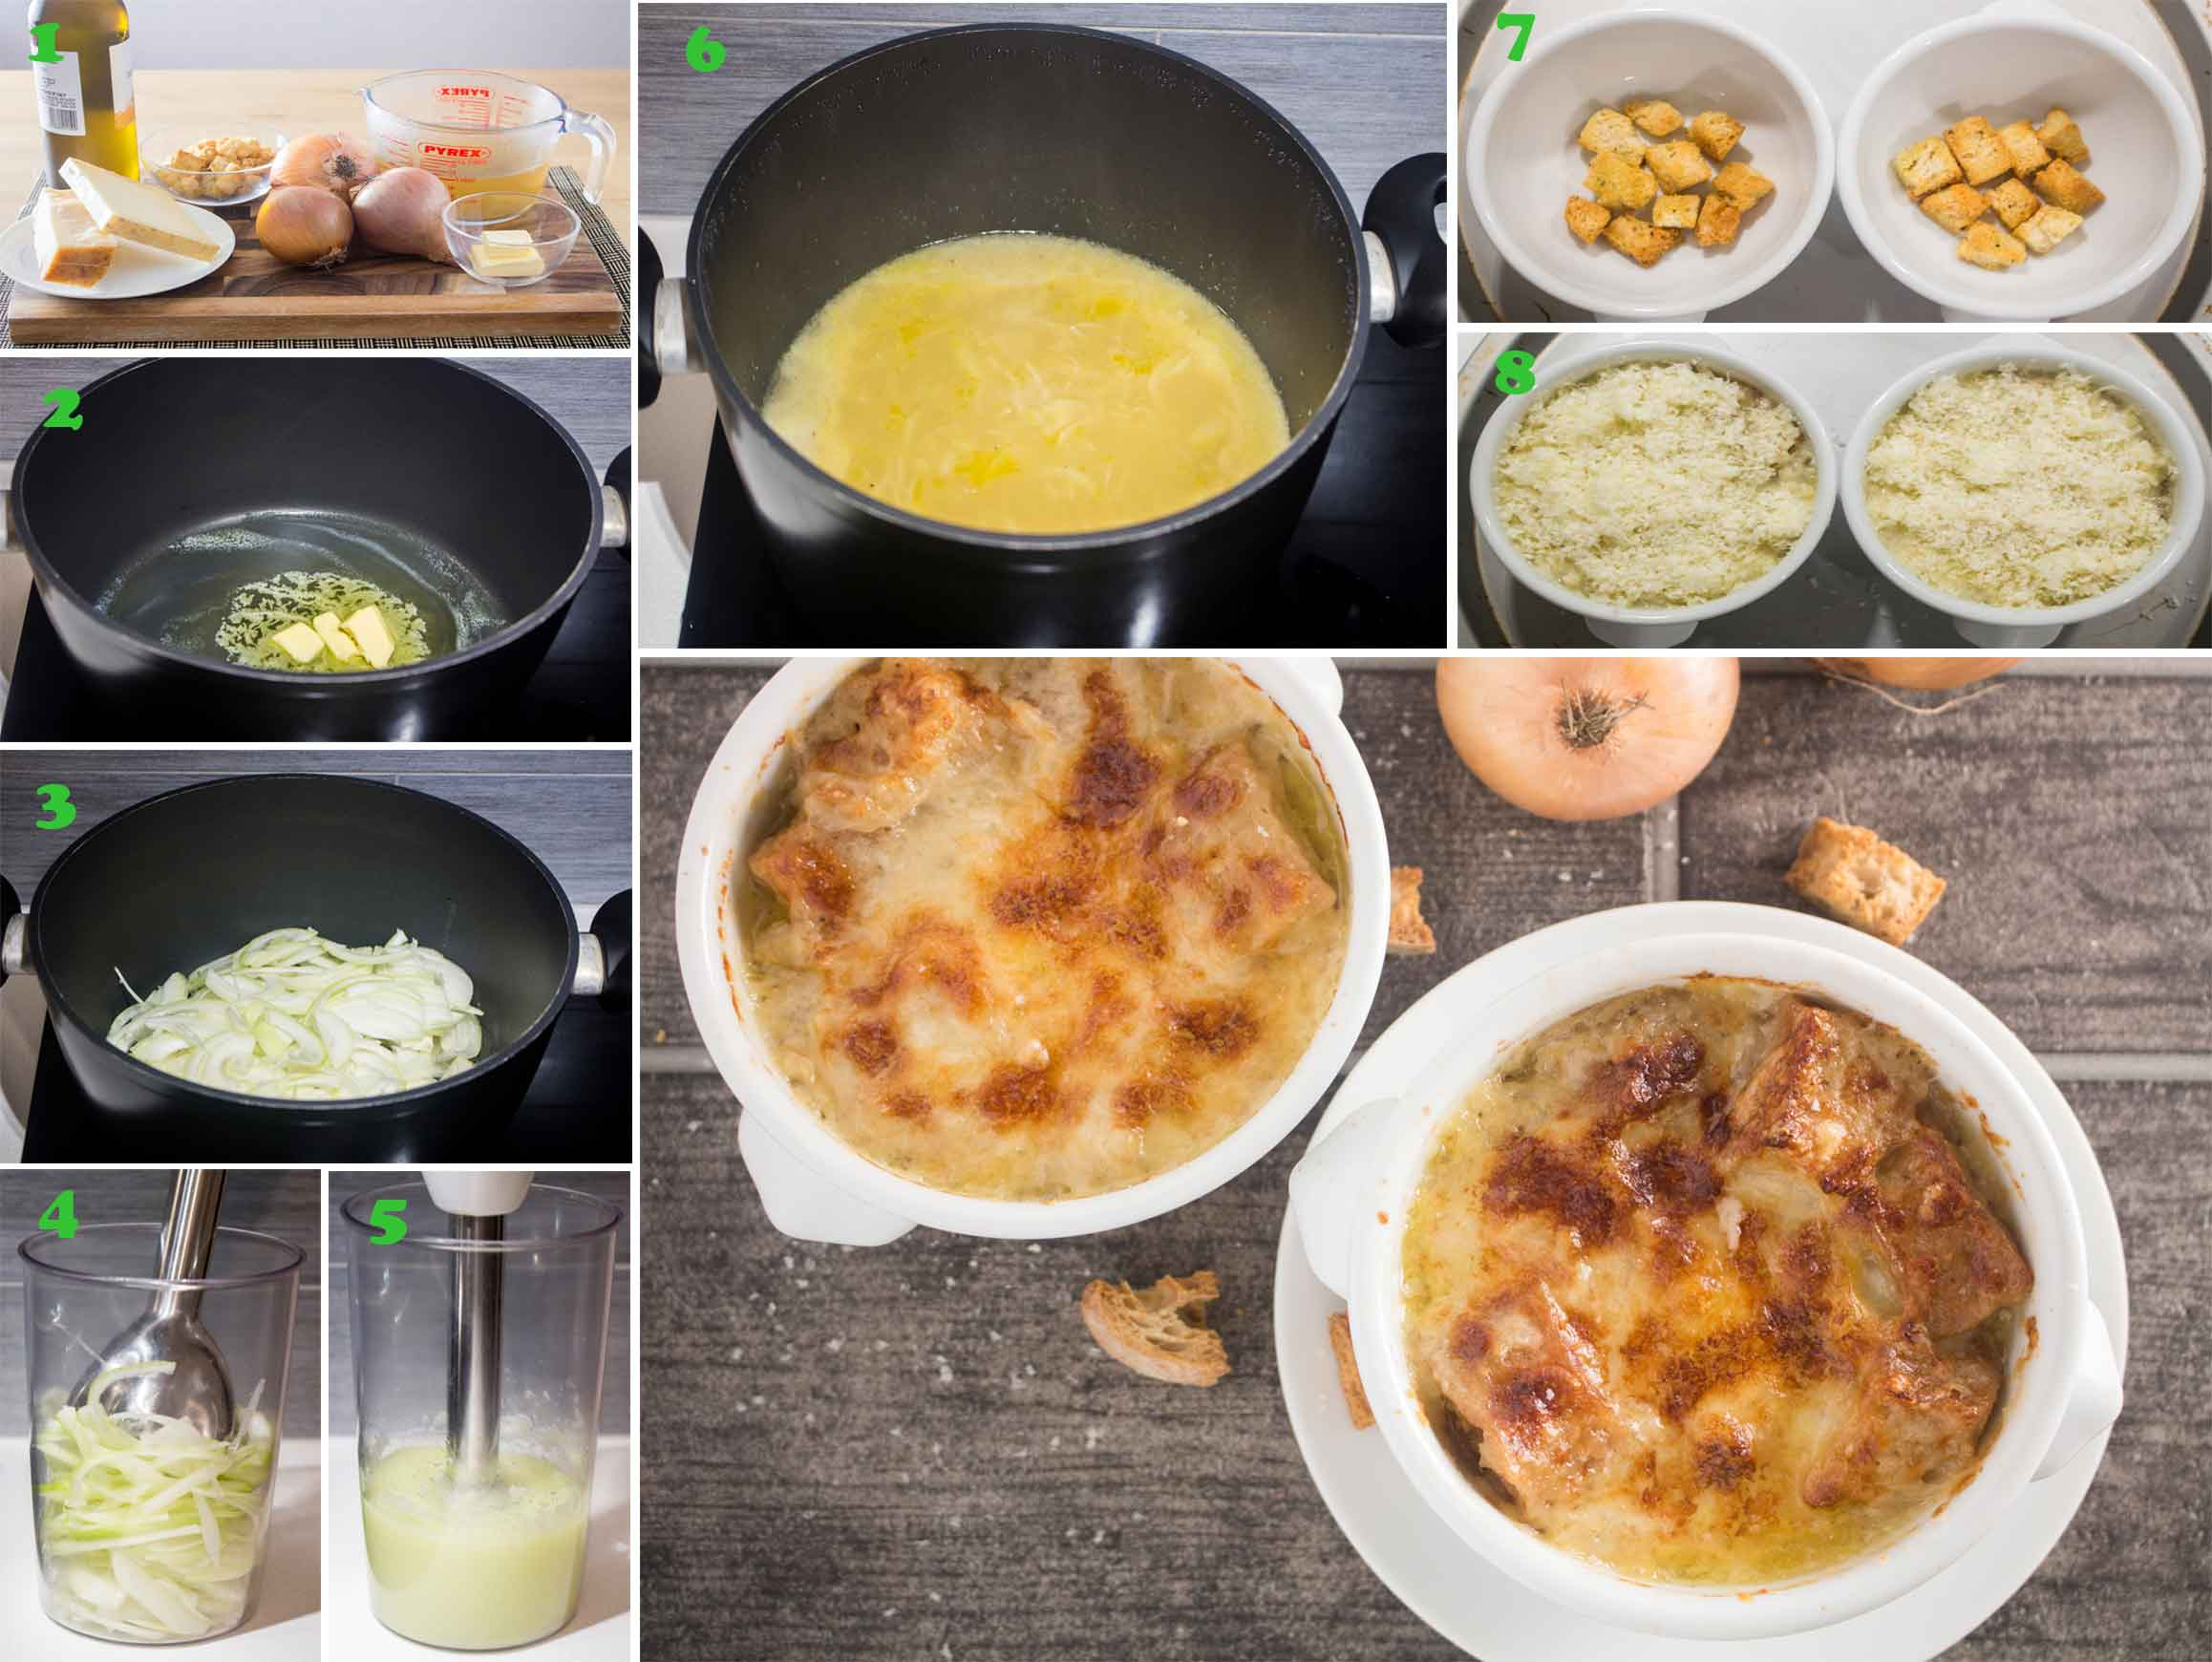 An image showing the steps to make onion soup gratin|foodandjourneys.net